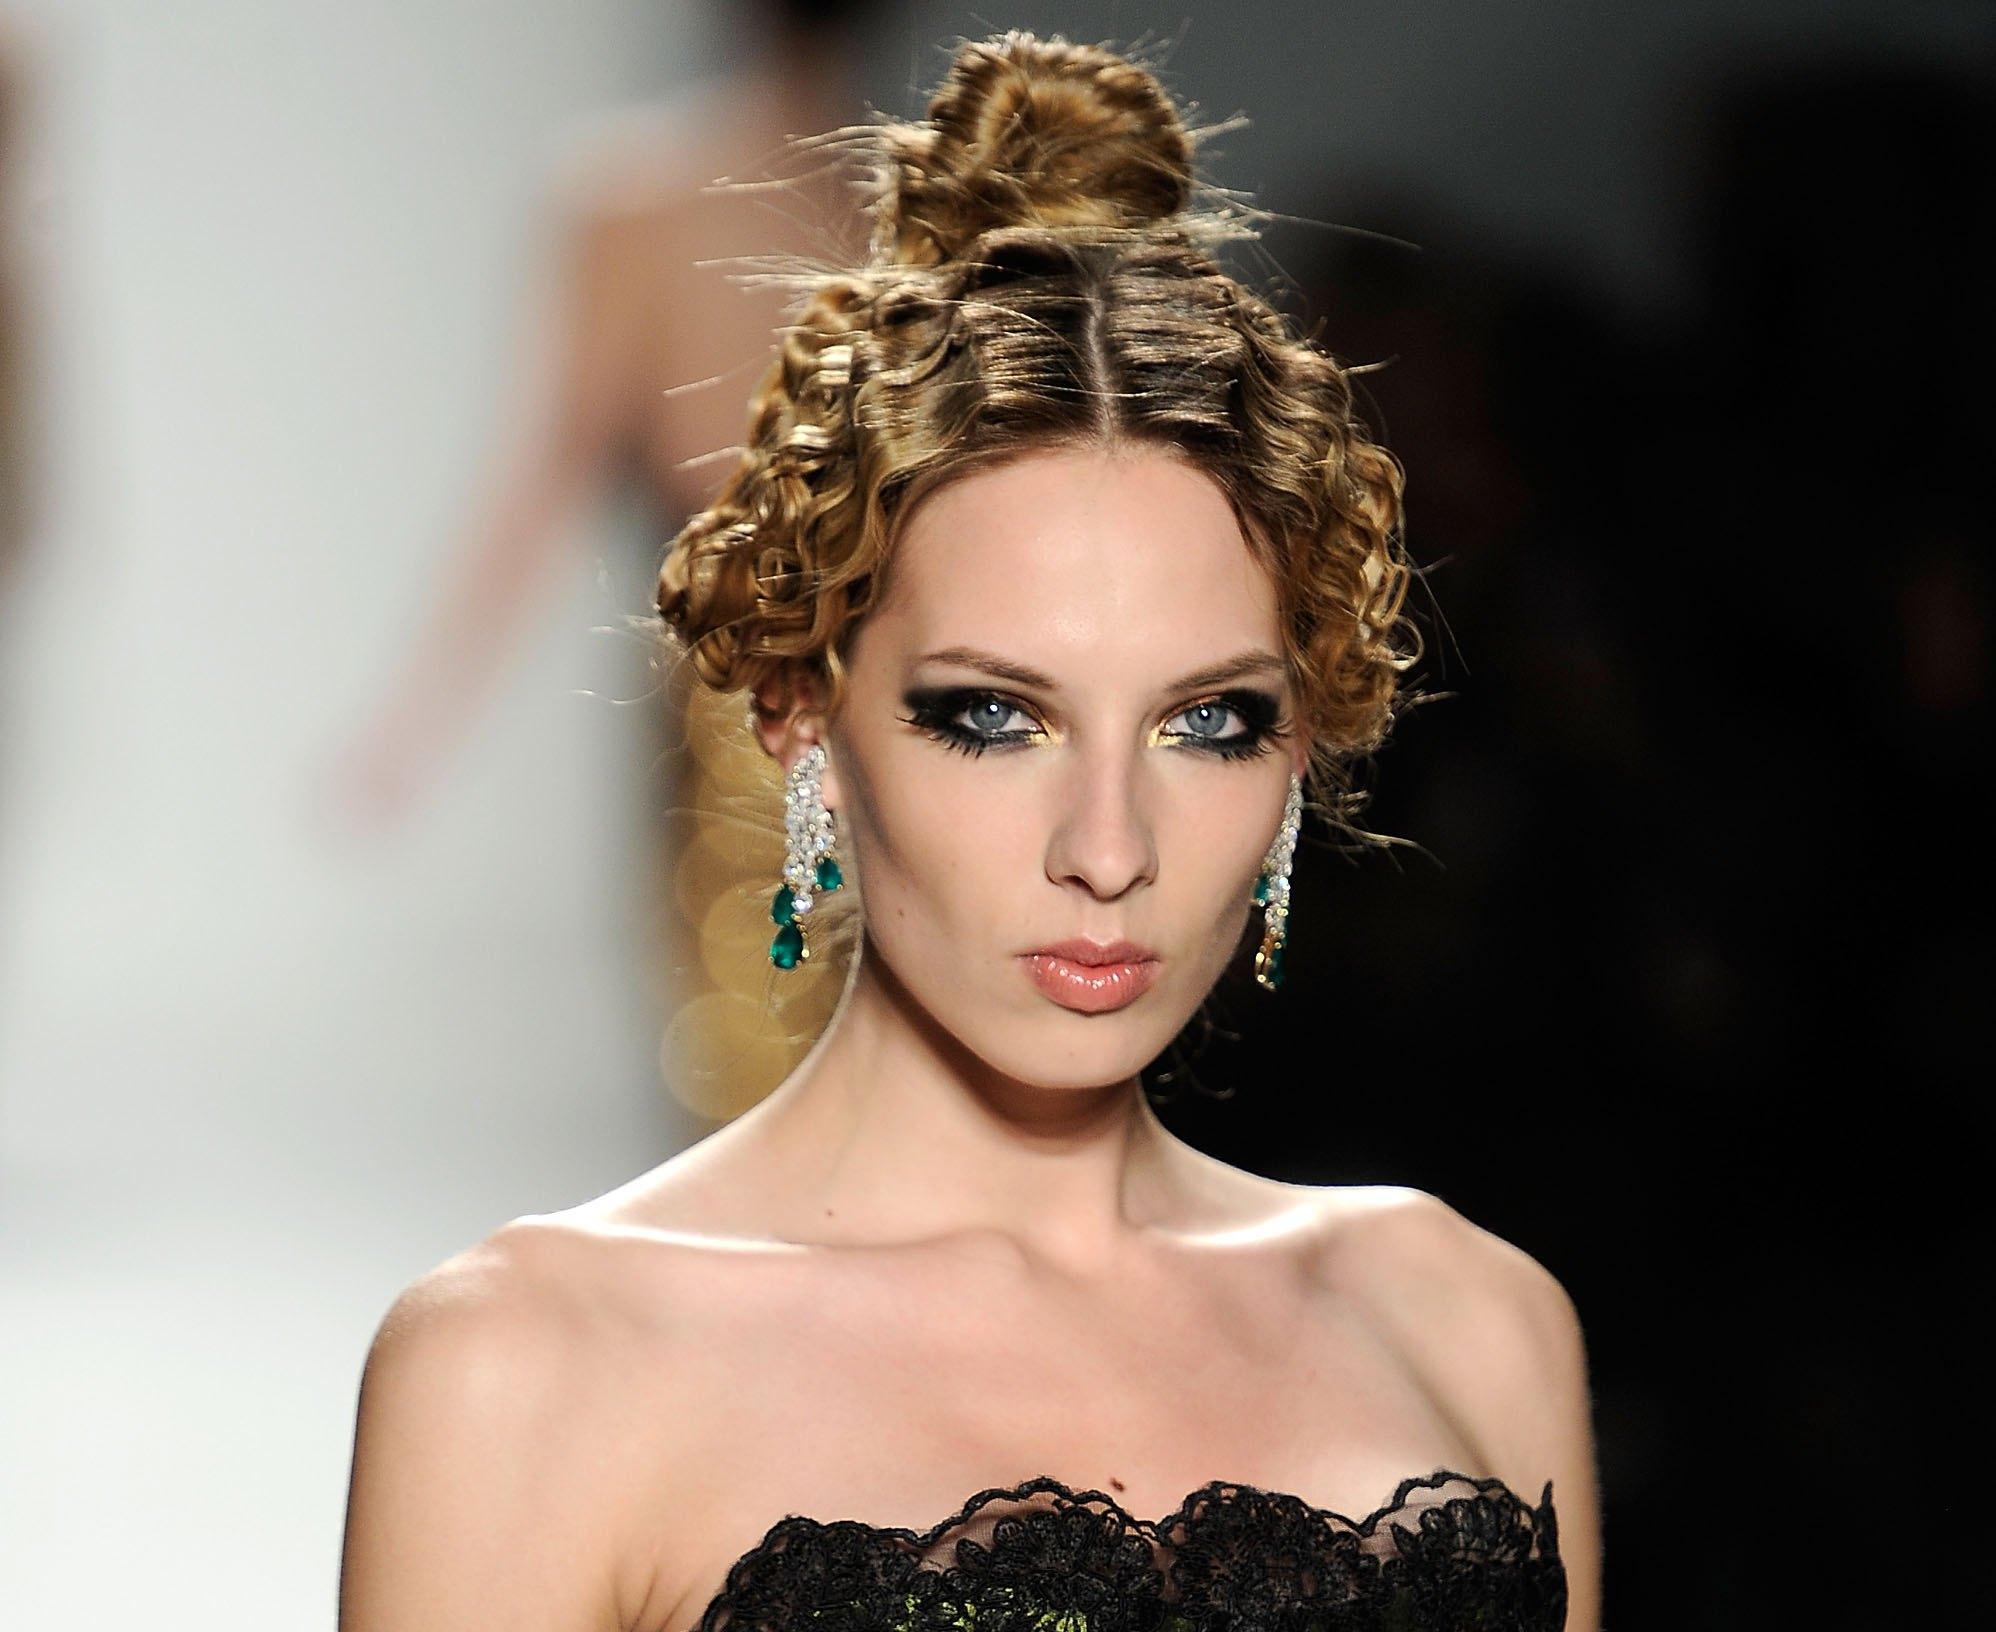 Дизайнер Кэти Стерн (Kati Stern) бренда Venexiana представила осеннюю коллекцию 2012 на Mercedes-Benz Fashion Week. Фото: Fernanda Calfat/Getty Images